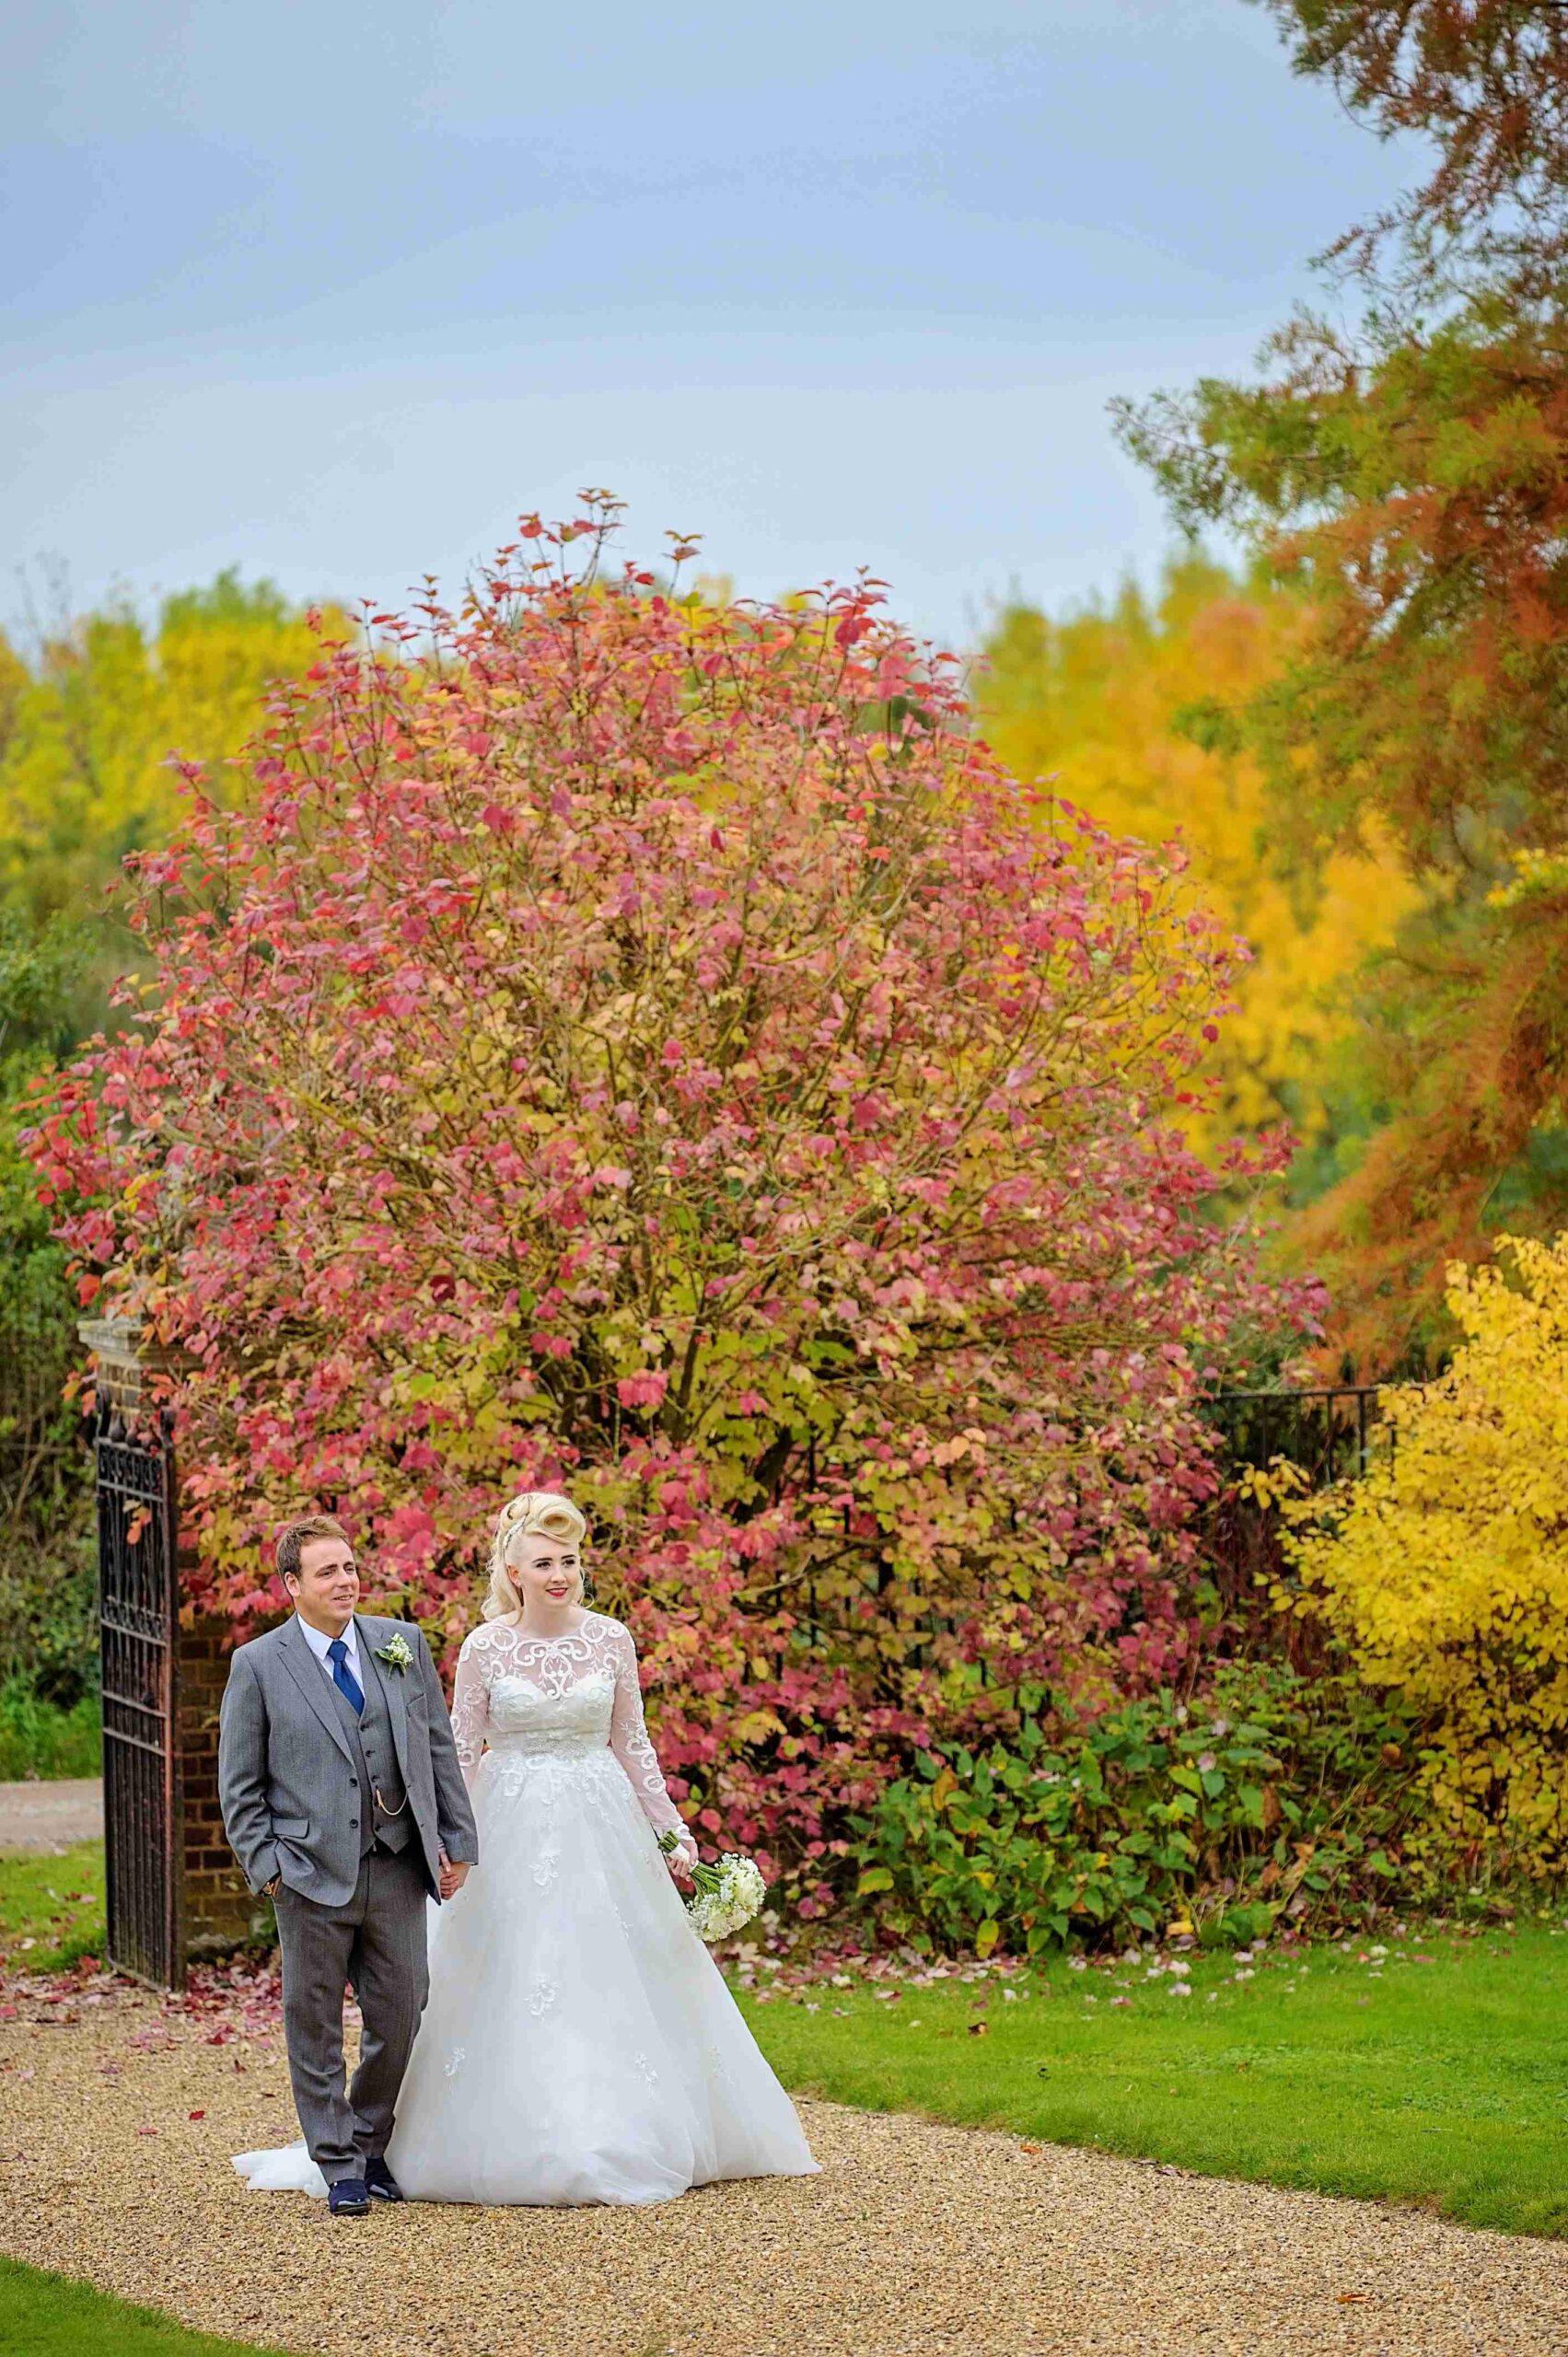 Autumn garden, bride and groom